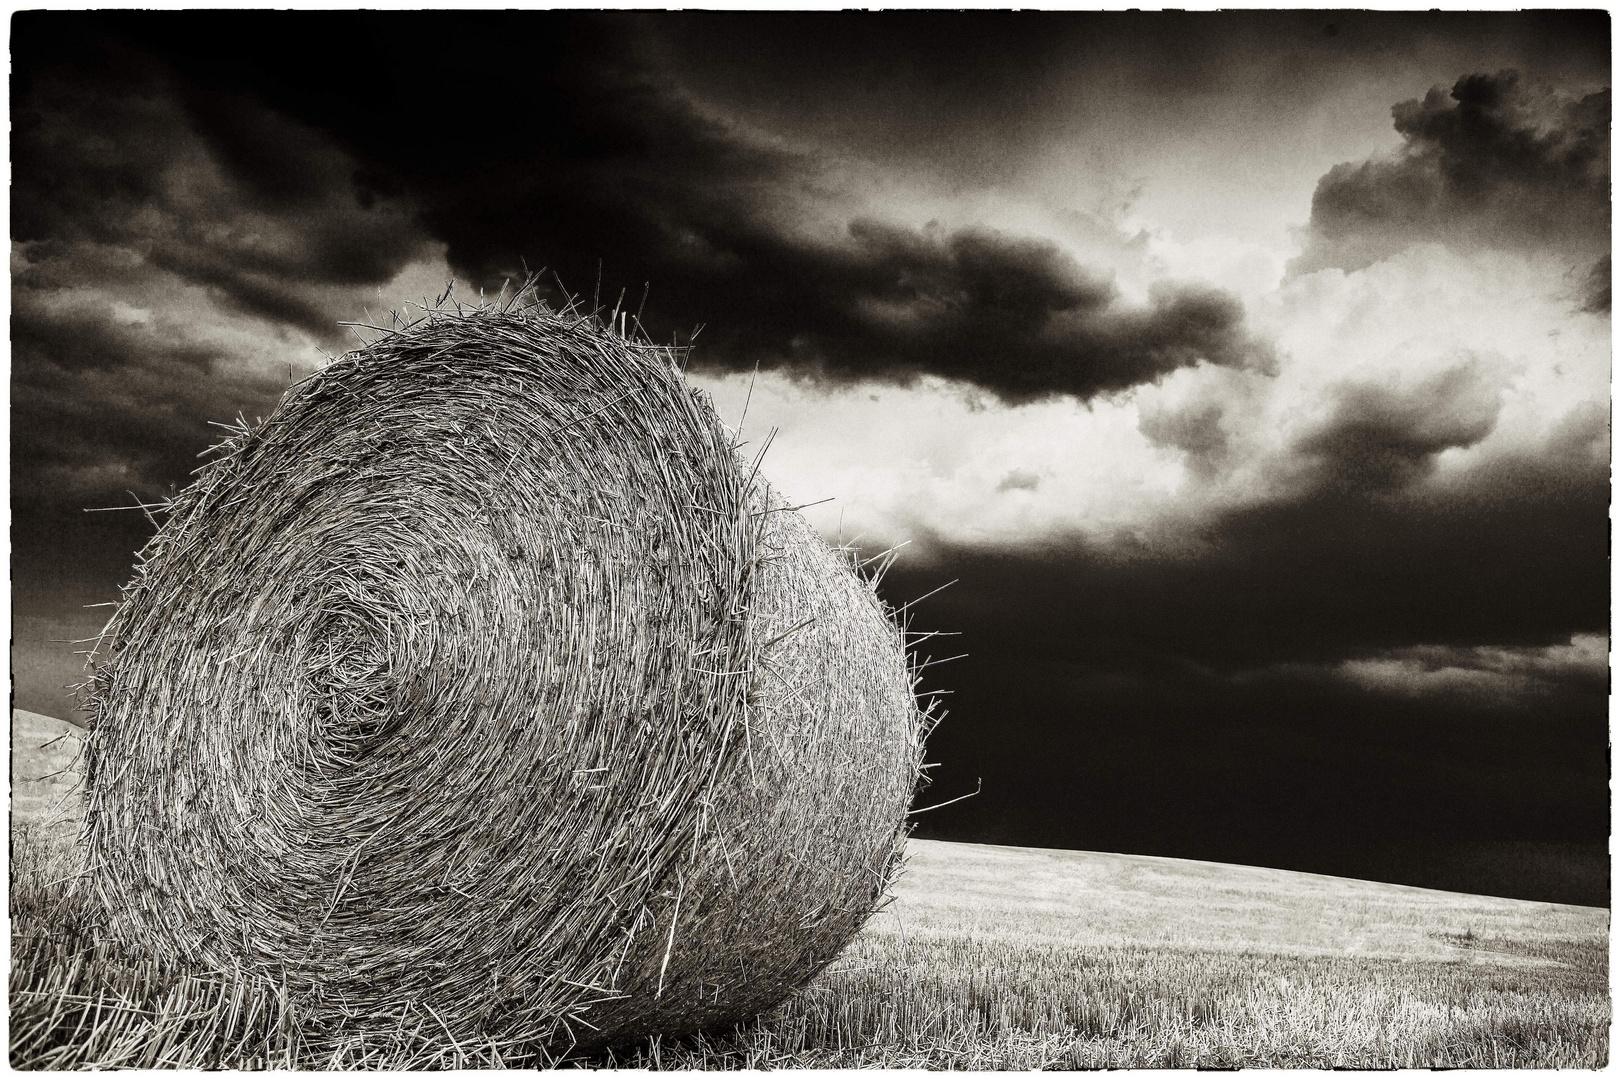 Strohballen im Sturm